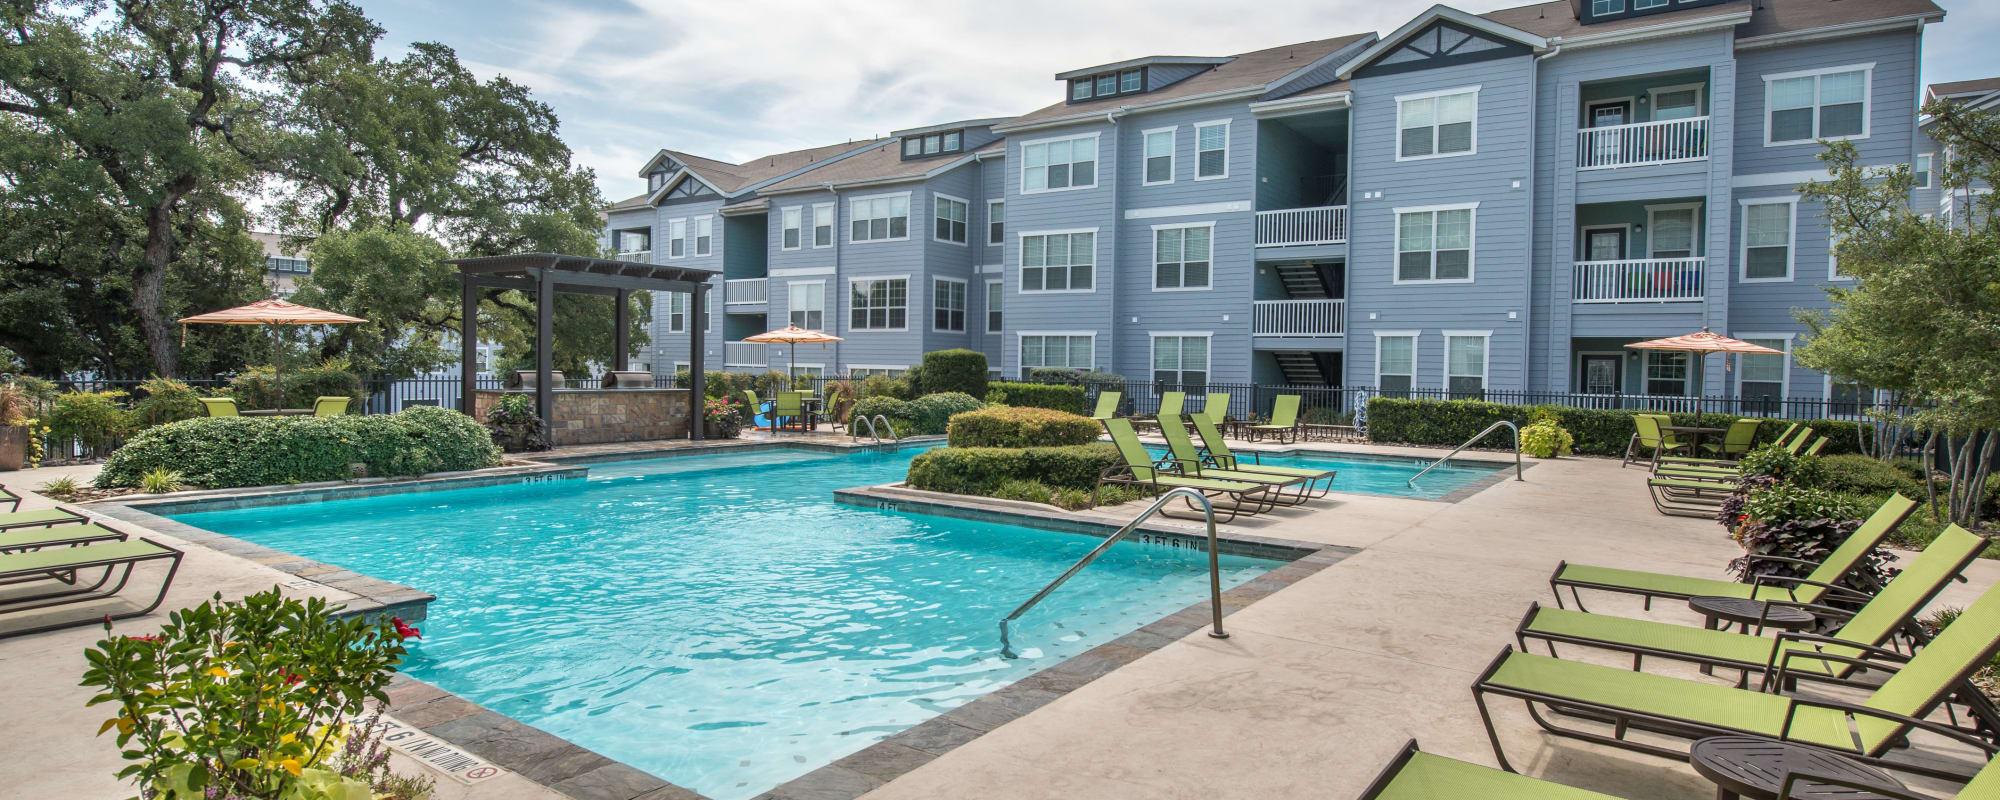 Resort style pool at Archer Stone Canyon in San Antonio, Texas